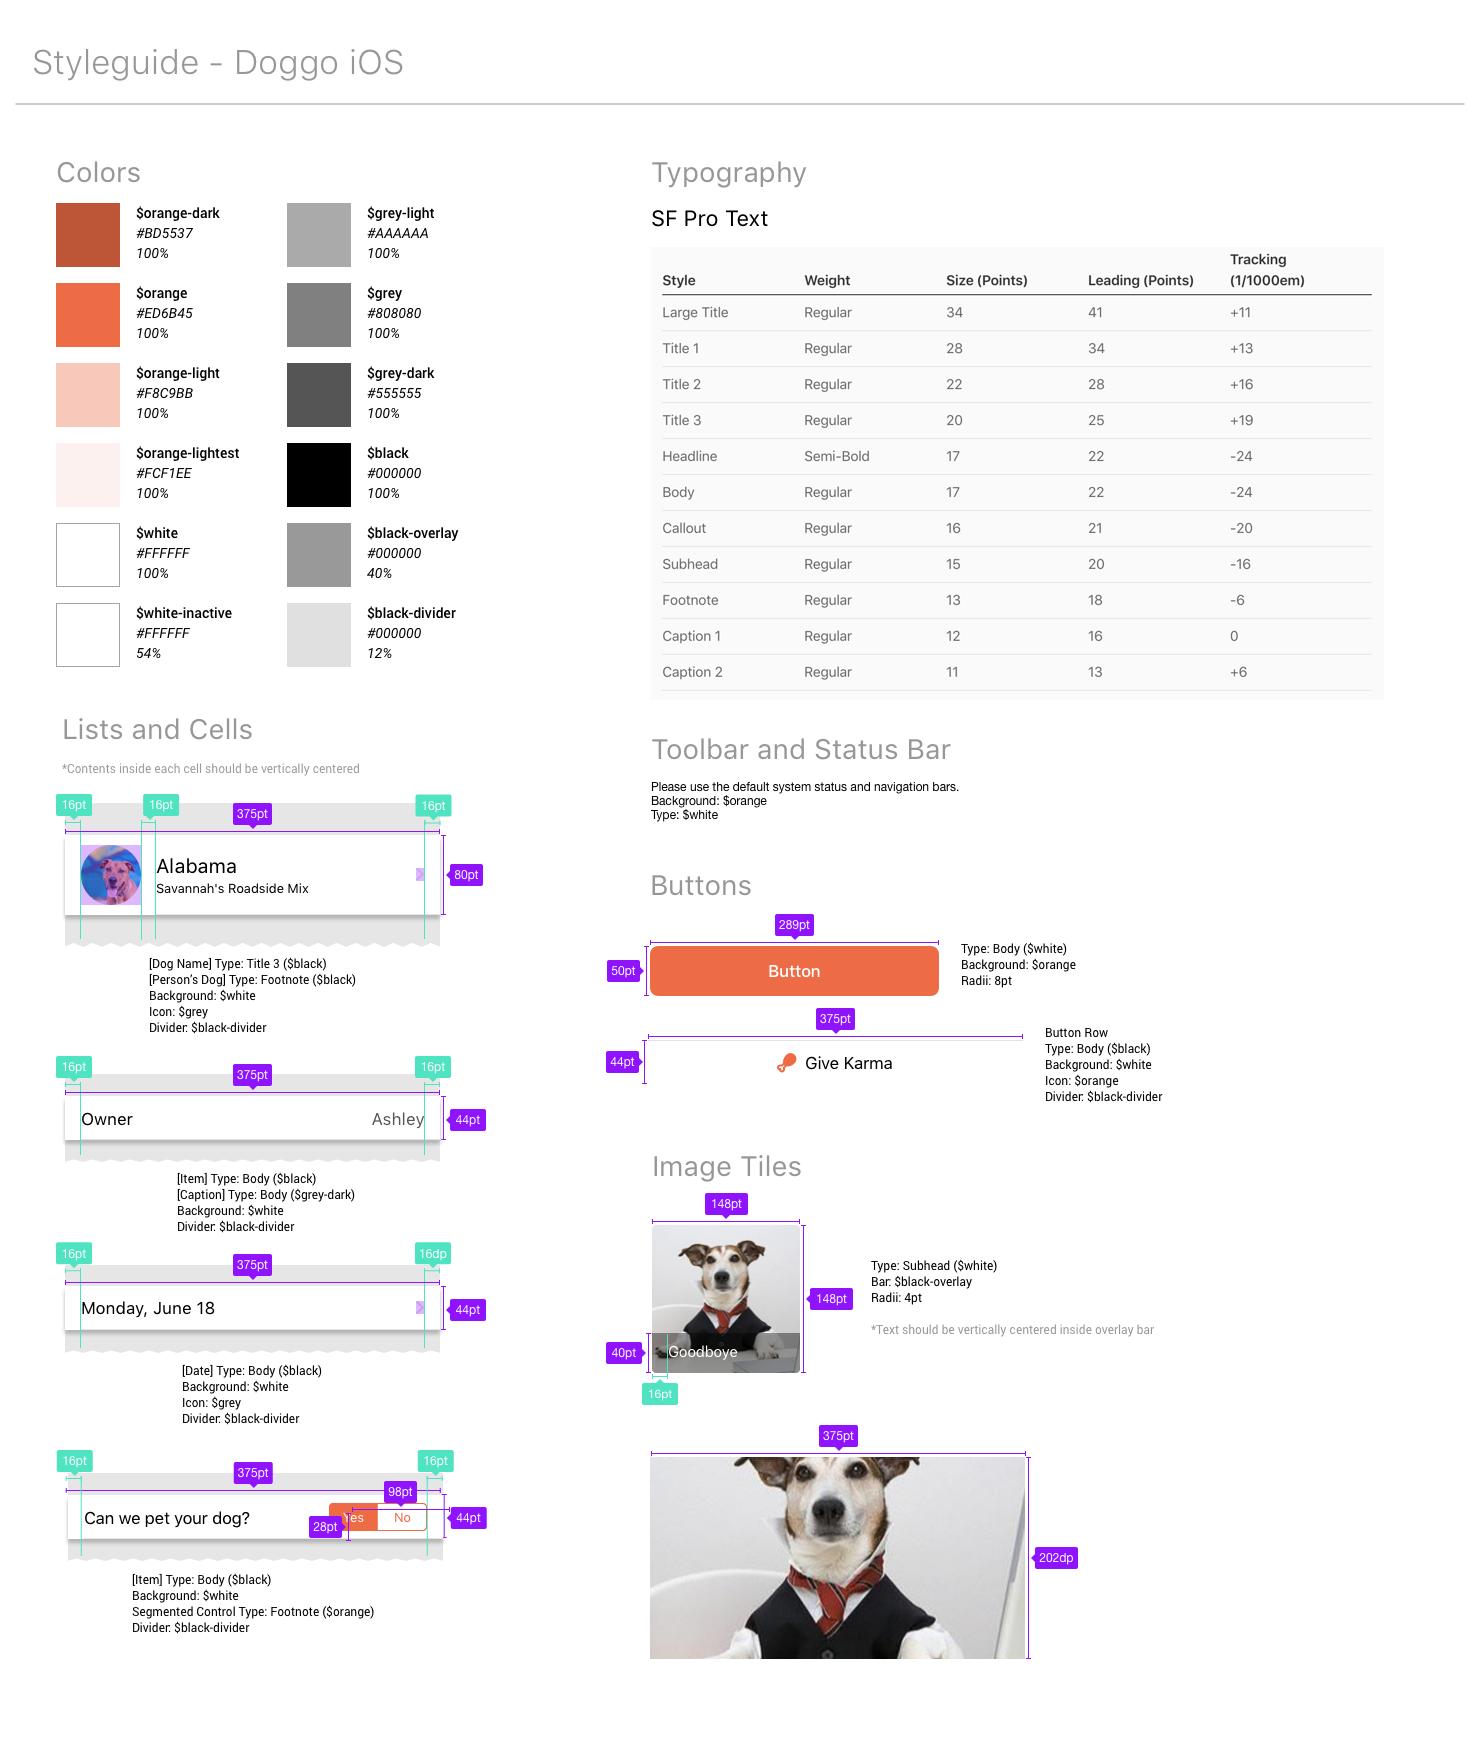 Doggo iOS Style Guide